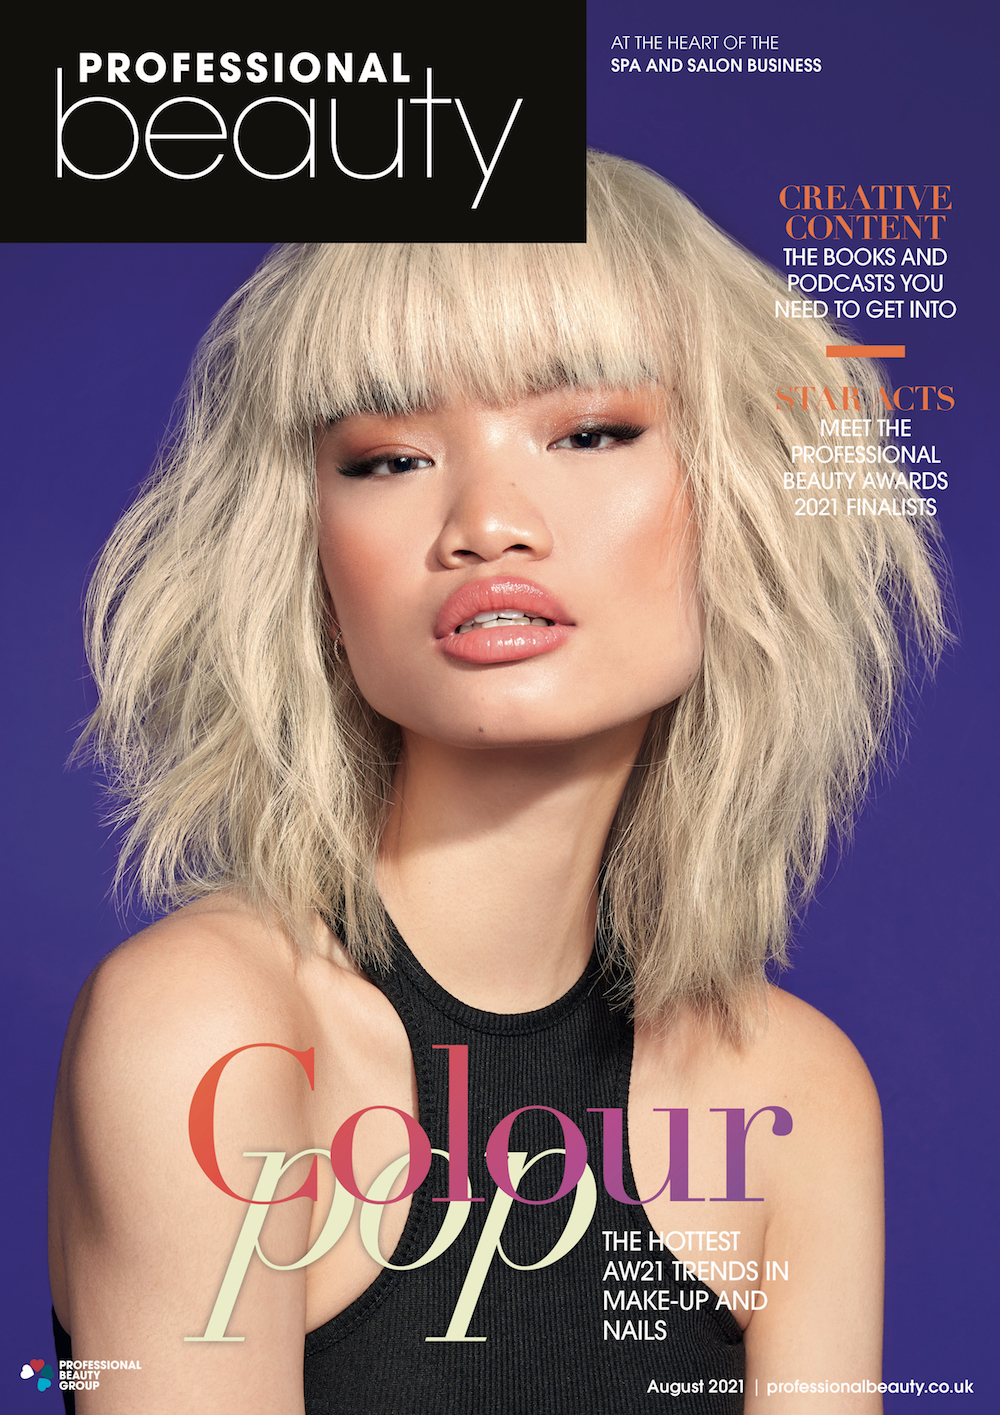 001  PBAugust21 - Front Cover copy